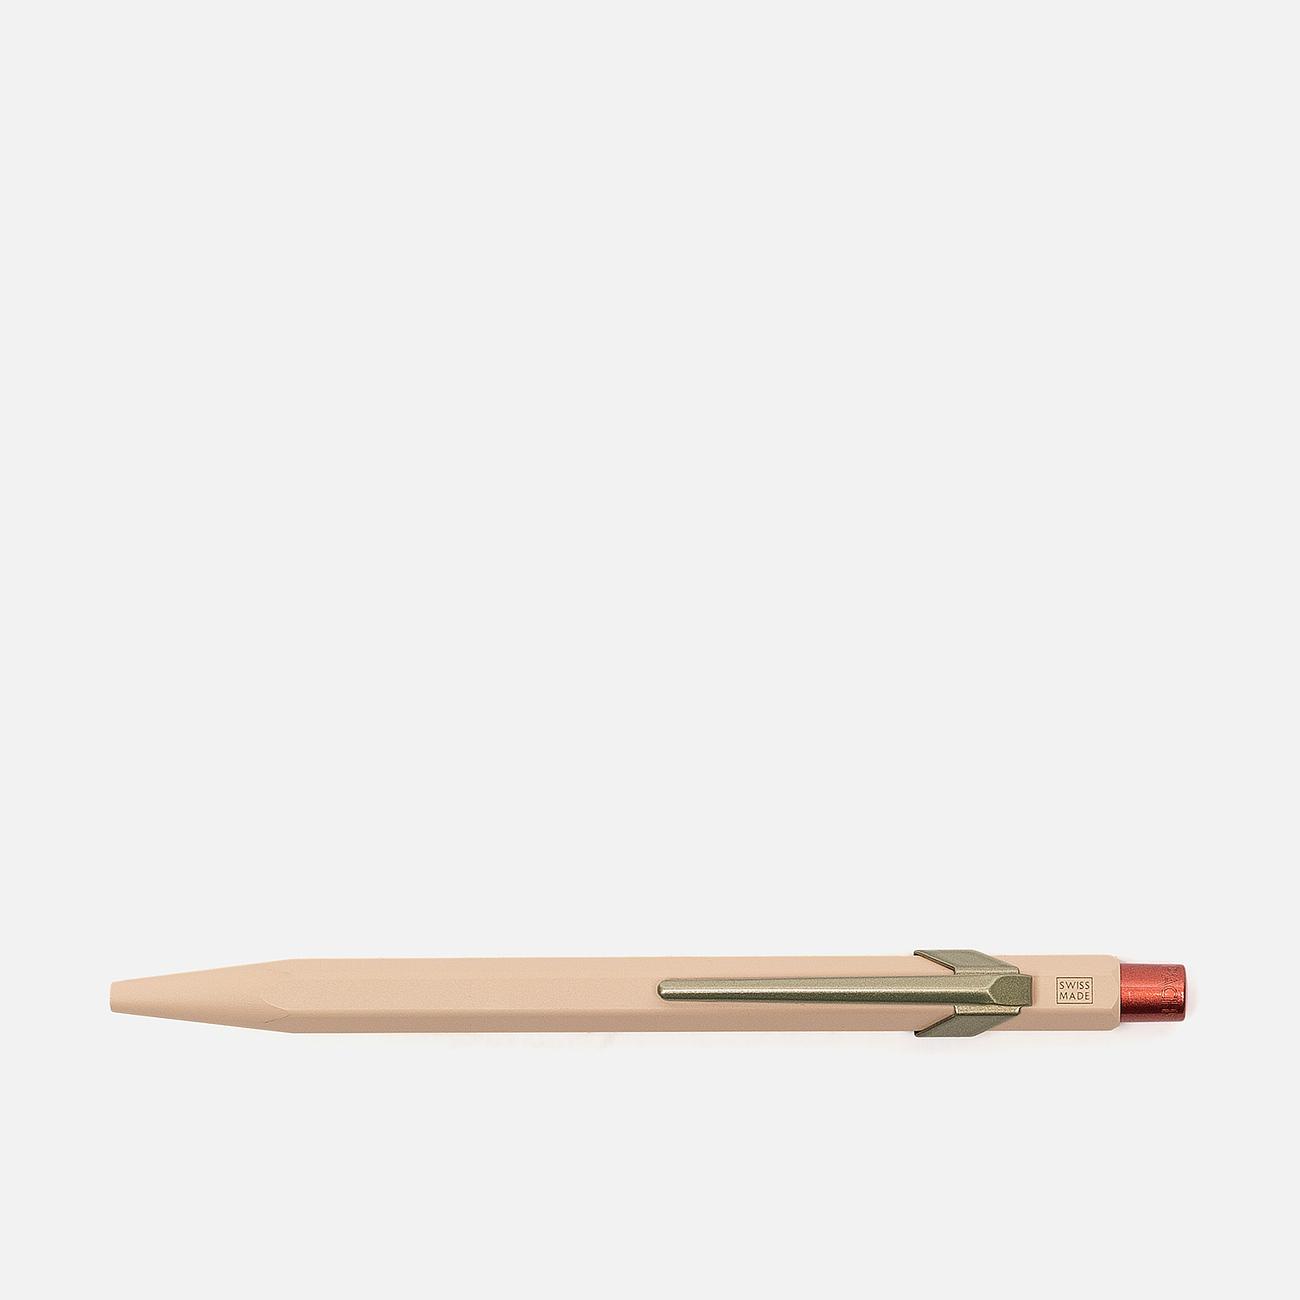 Ручка Caran d'Ache 849 Office Claim Your Style Beige